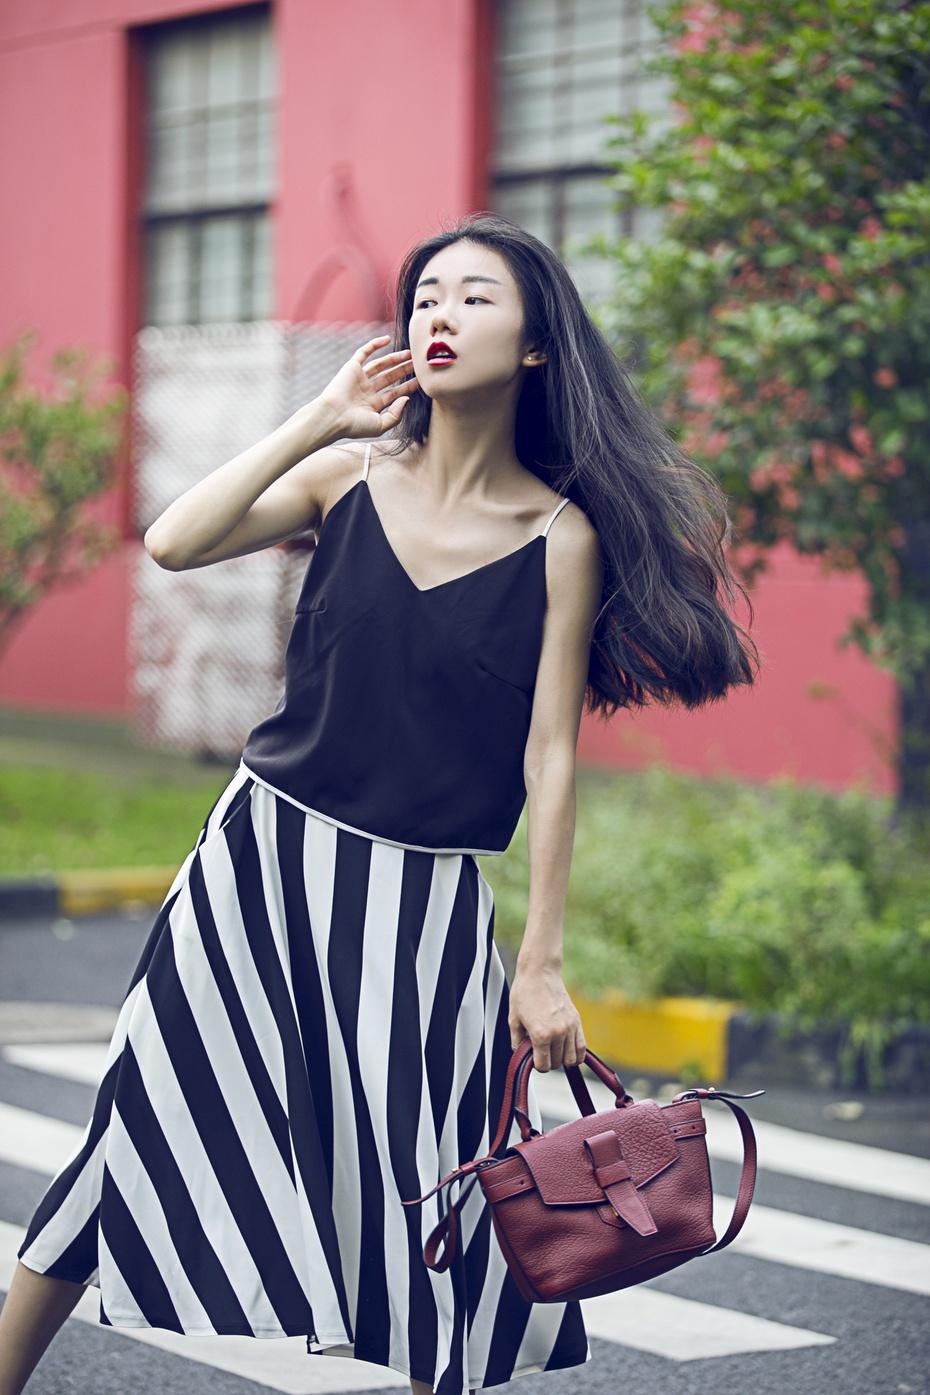 [Ava搭配日记]我好像缺一个包包 - AvaFoo - Avas Fashion Blog